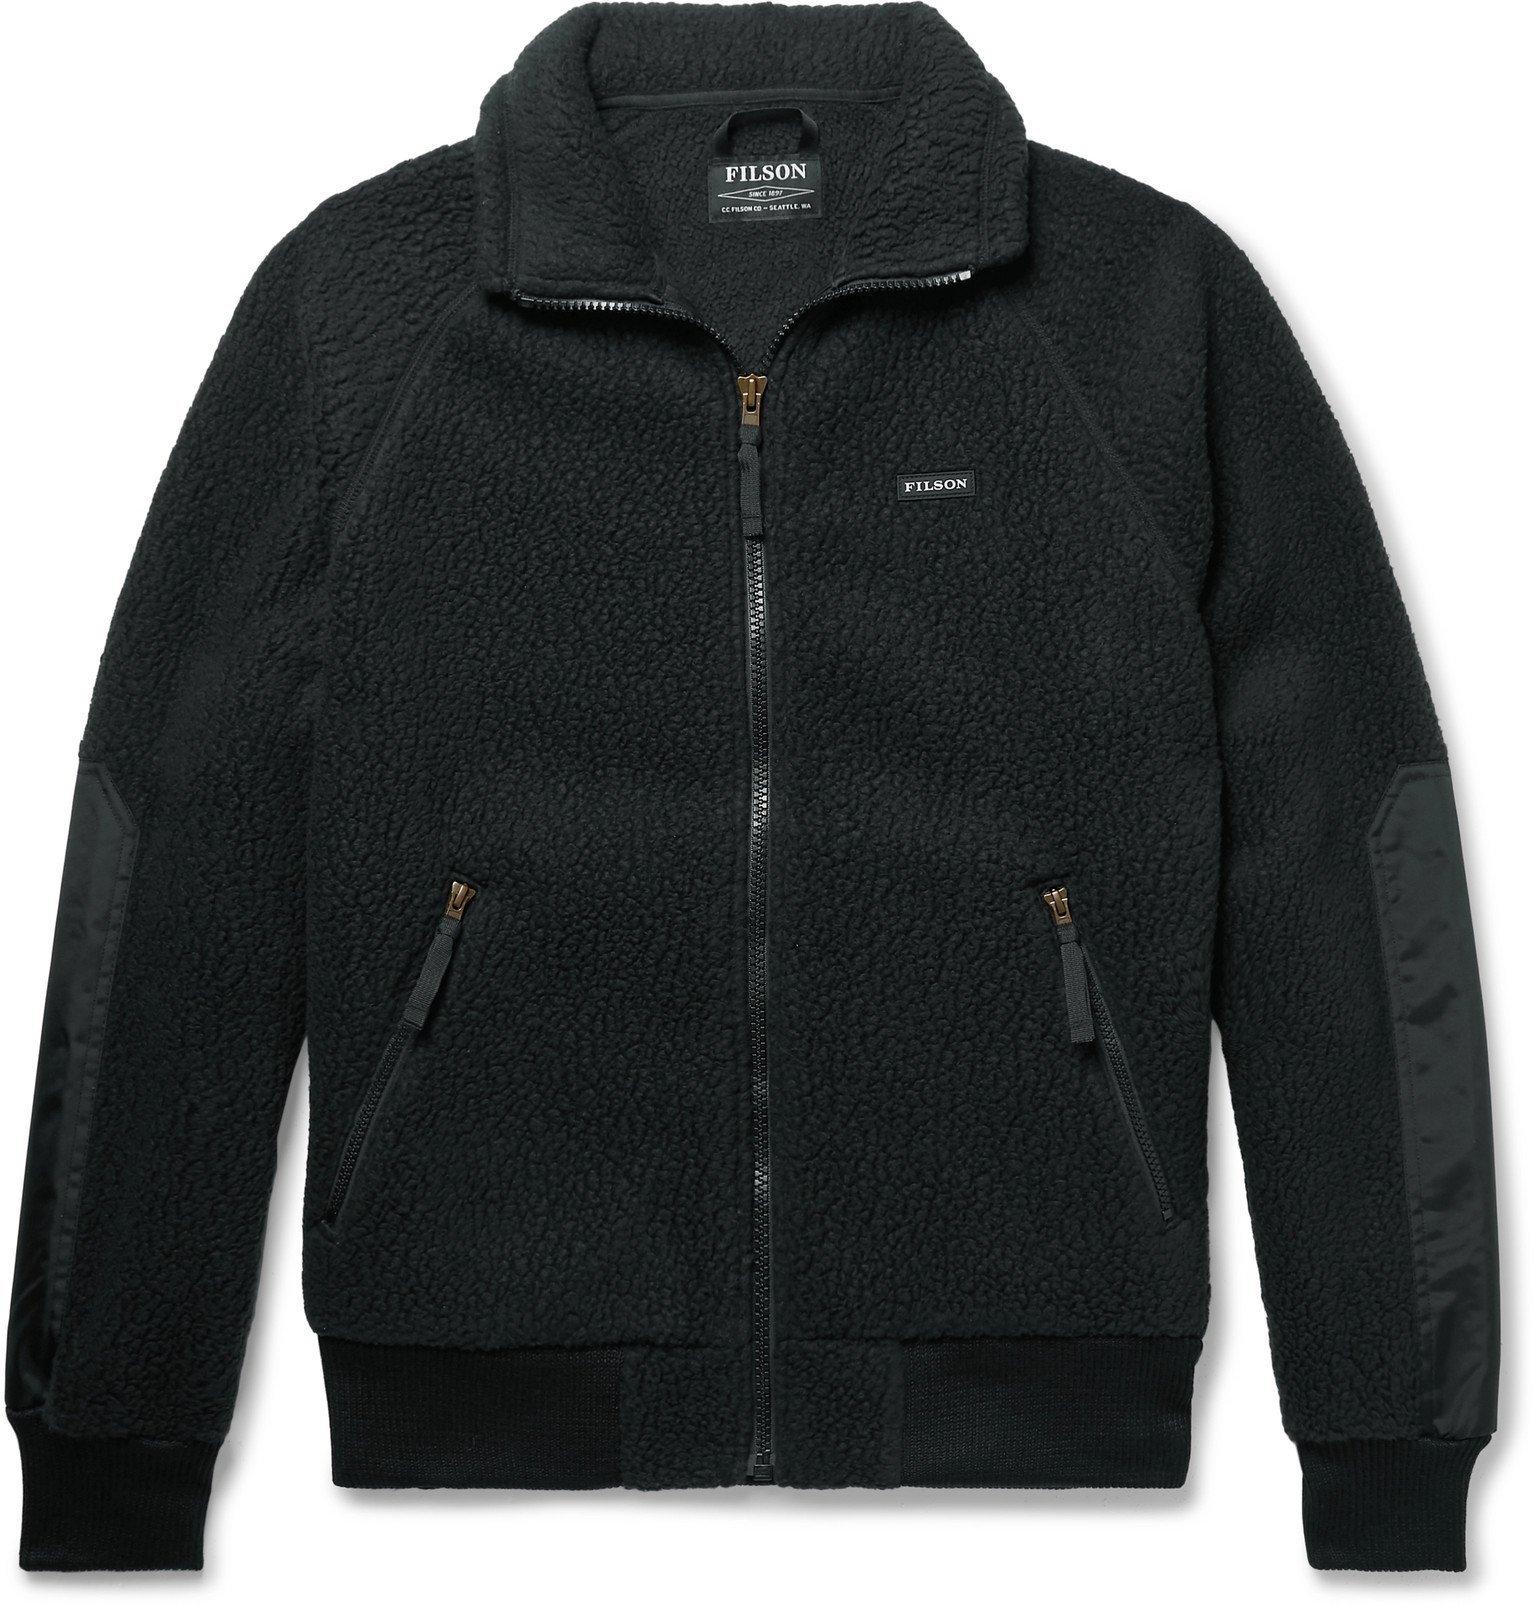 Photo: Filson - Nylon-Trimmed Polartec Thermal Pro Fleece Jacket - Black